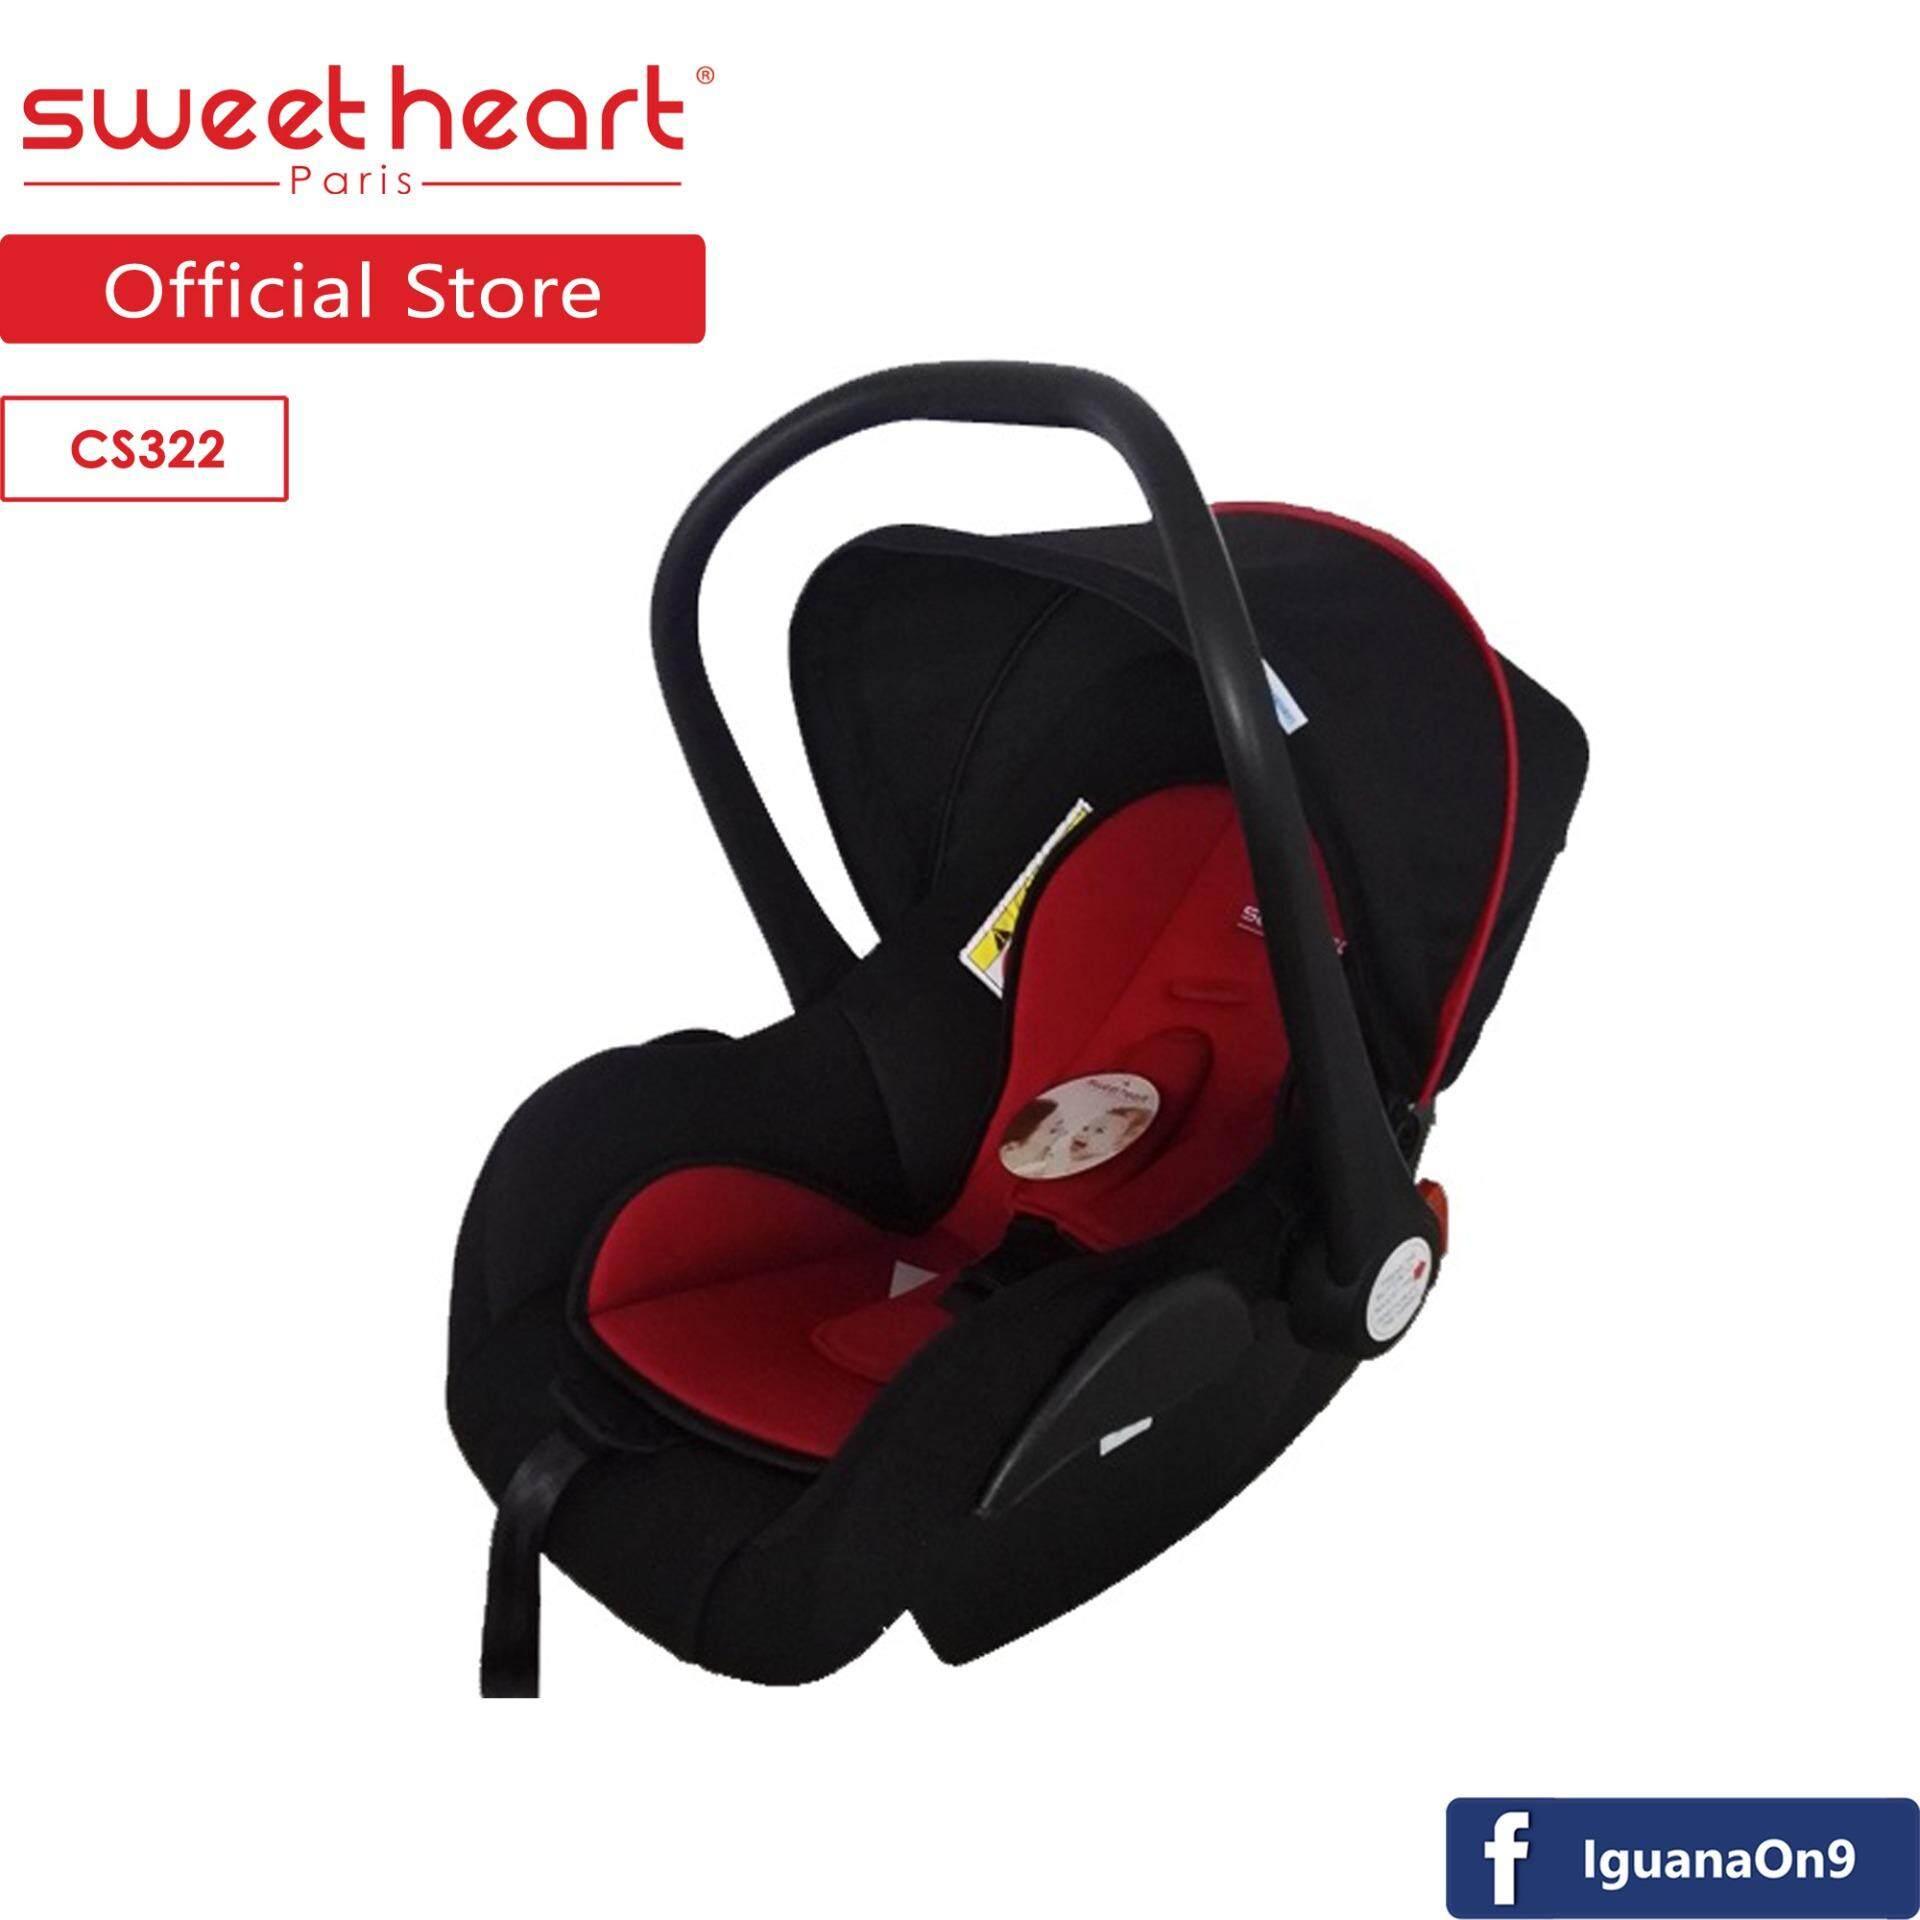 Sweet Heart Paris Cs322 Car Seat Carrier ใช้งานได้ดี คุณภาพสมราคา คาร์ซีทเด็กอ่อน With Ecer44 Standard.